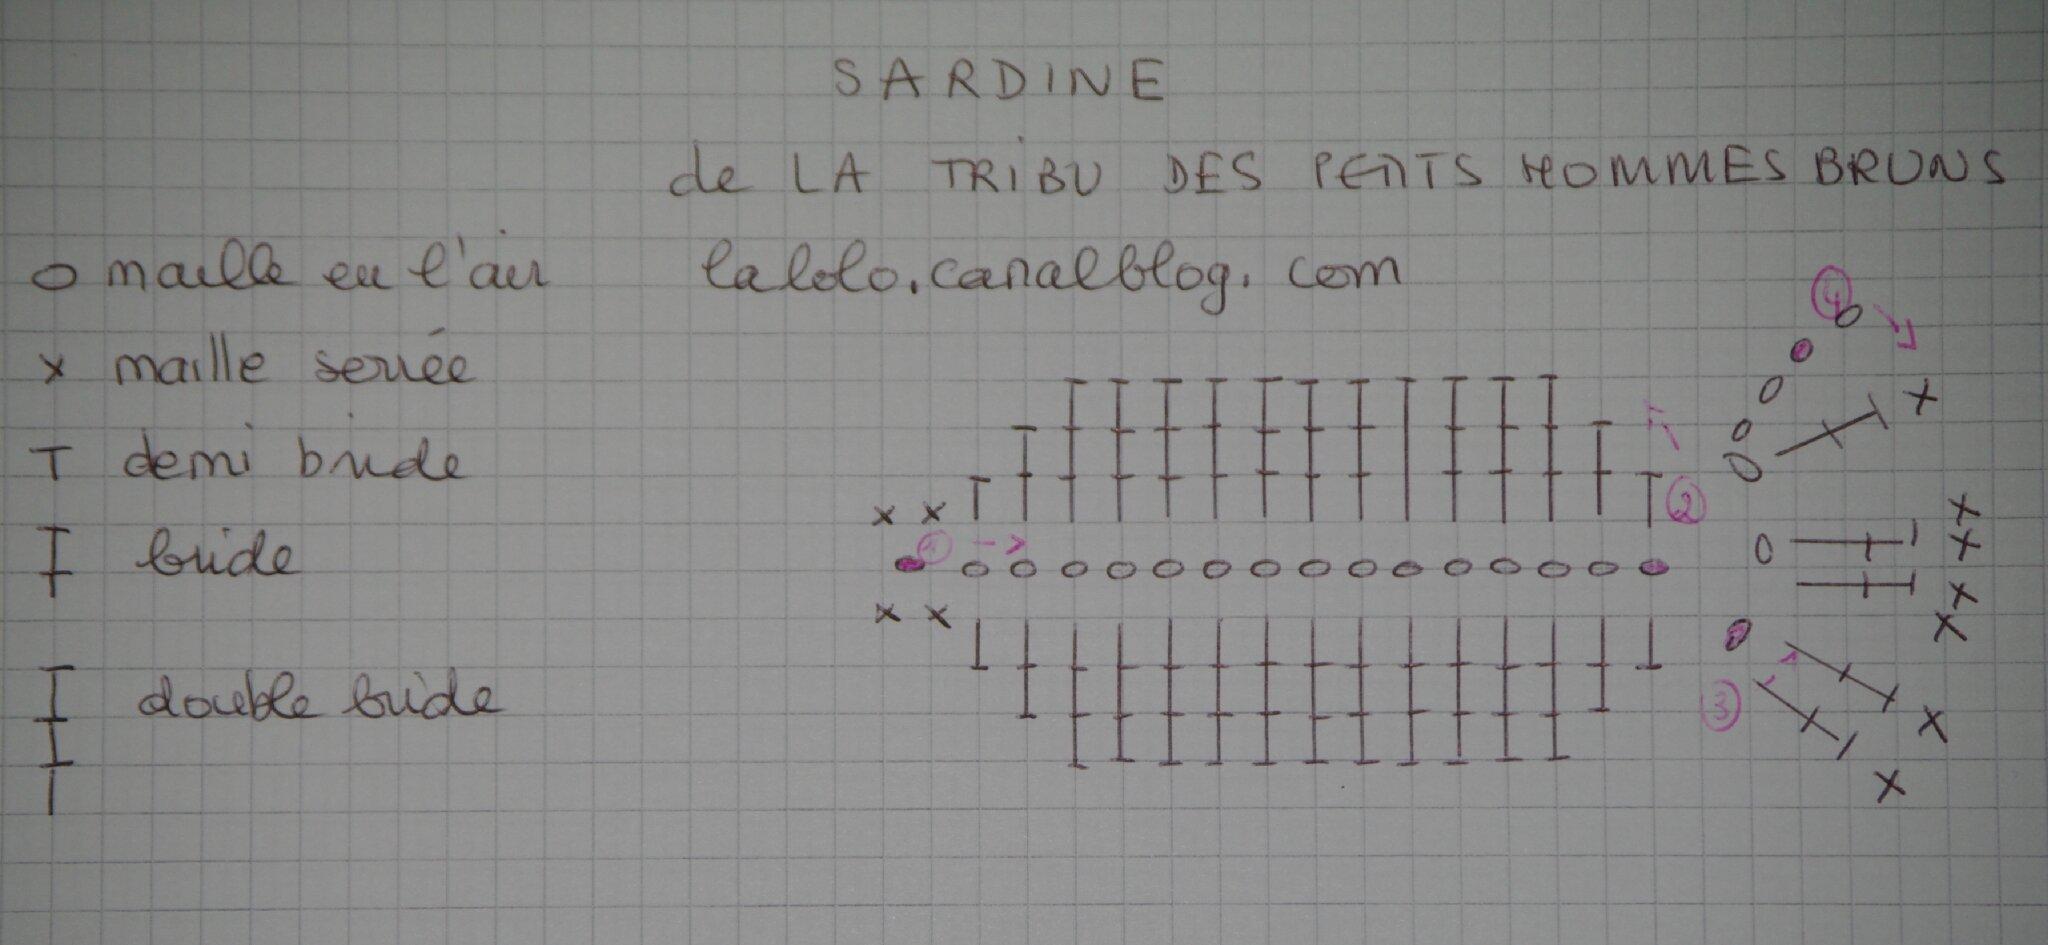 tutoriel sardine poisson au crochet